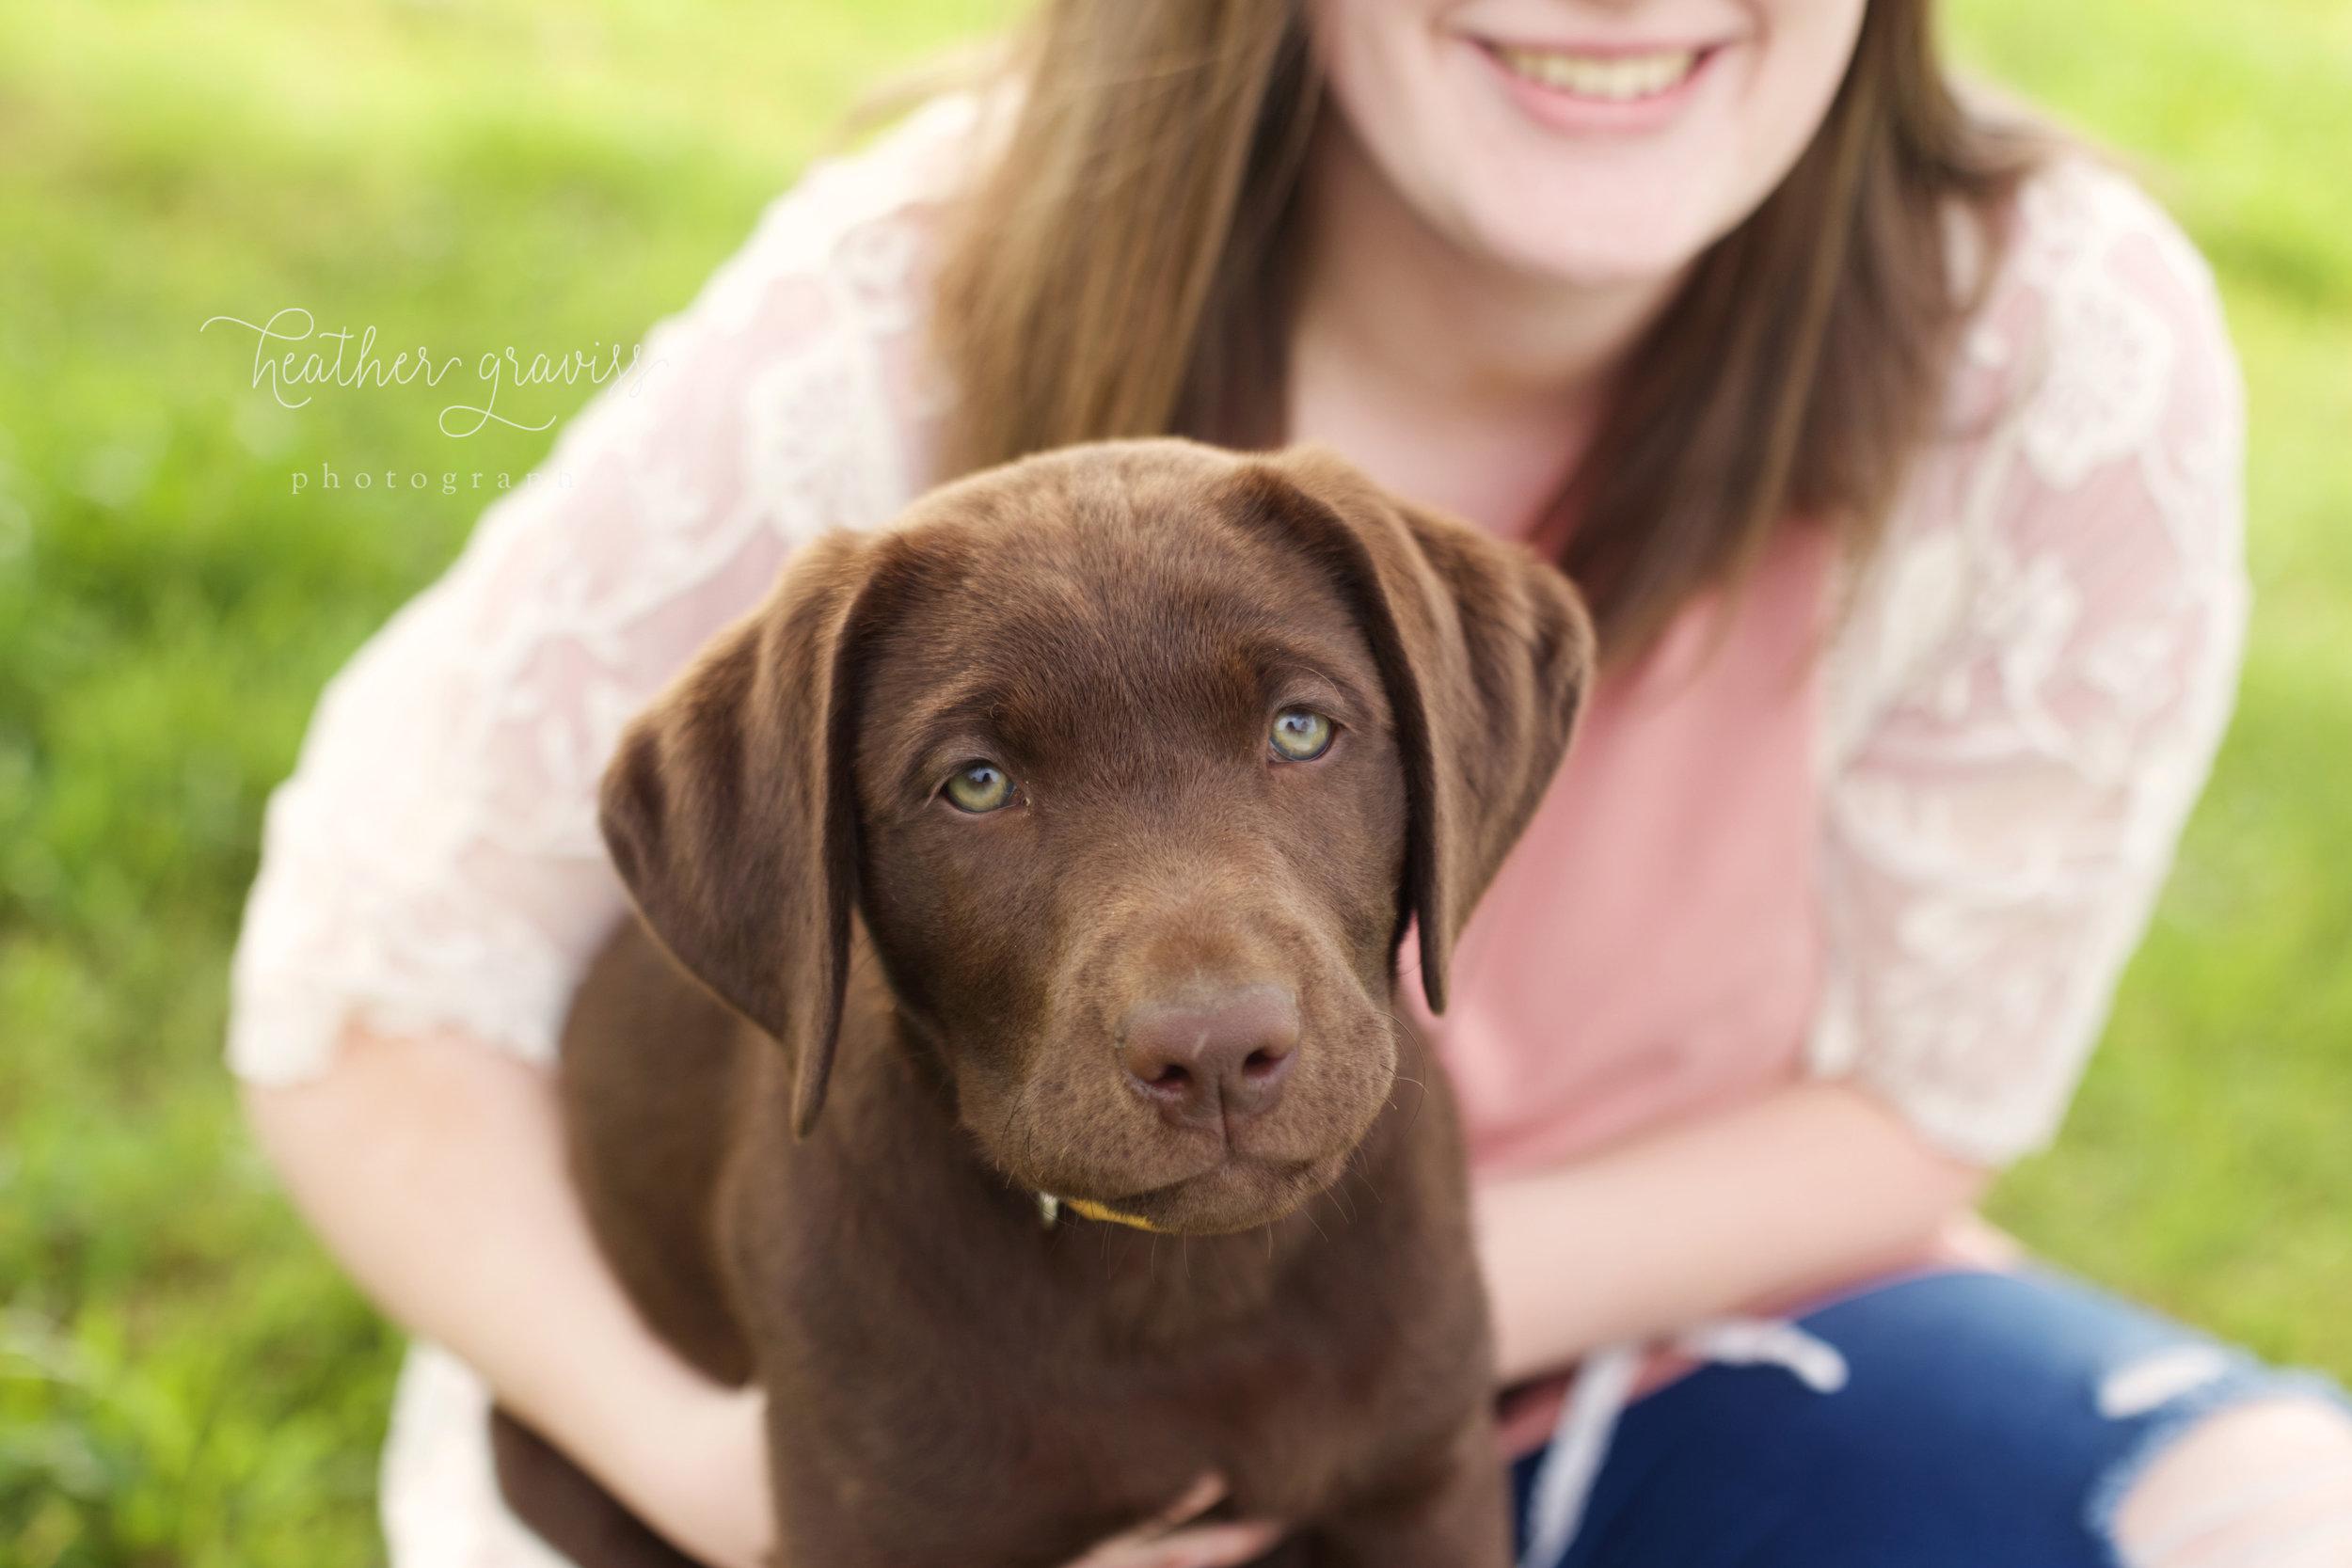 little-brown-dog.jpg